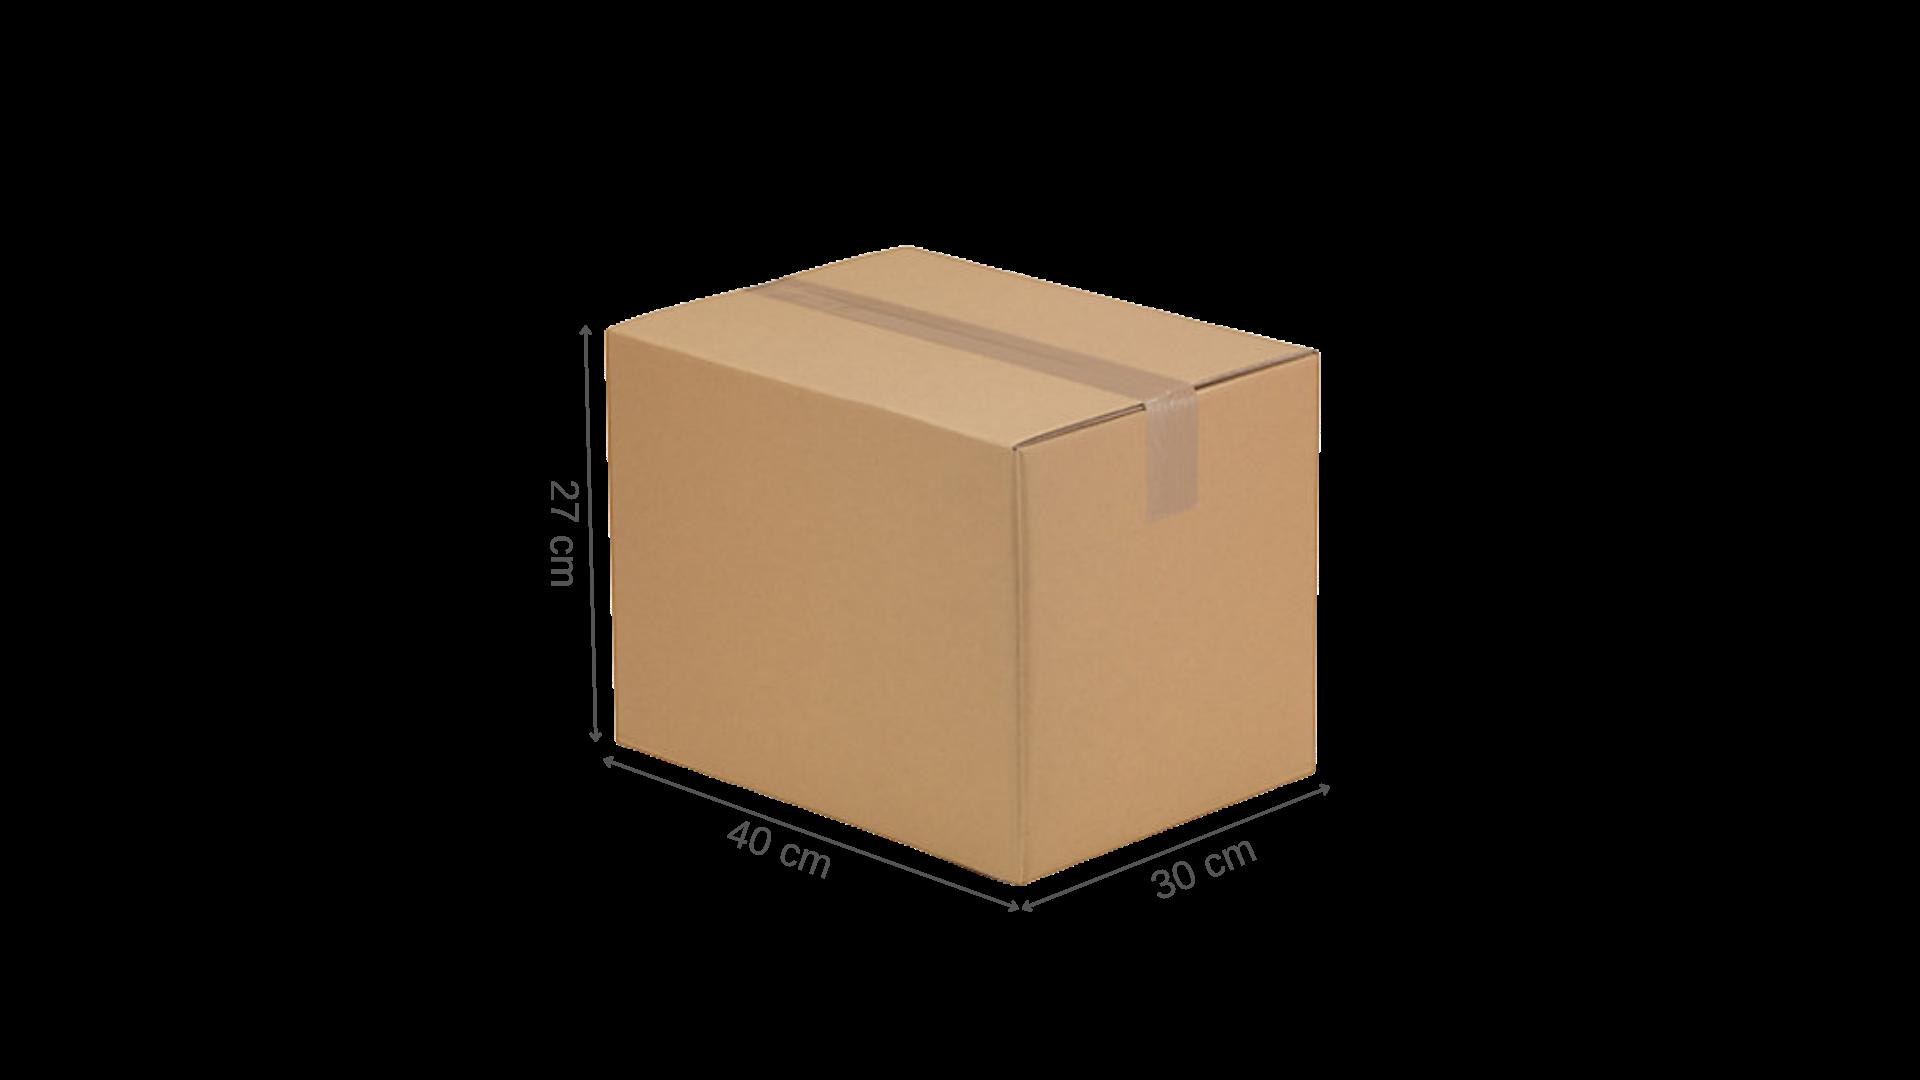 Carton simple cannelure 40x30x27 dimensions